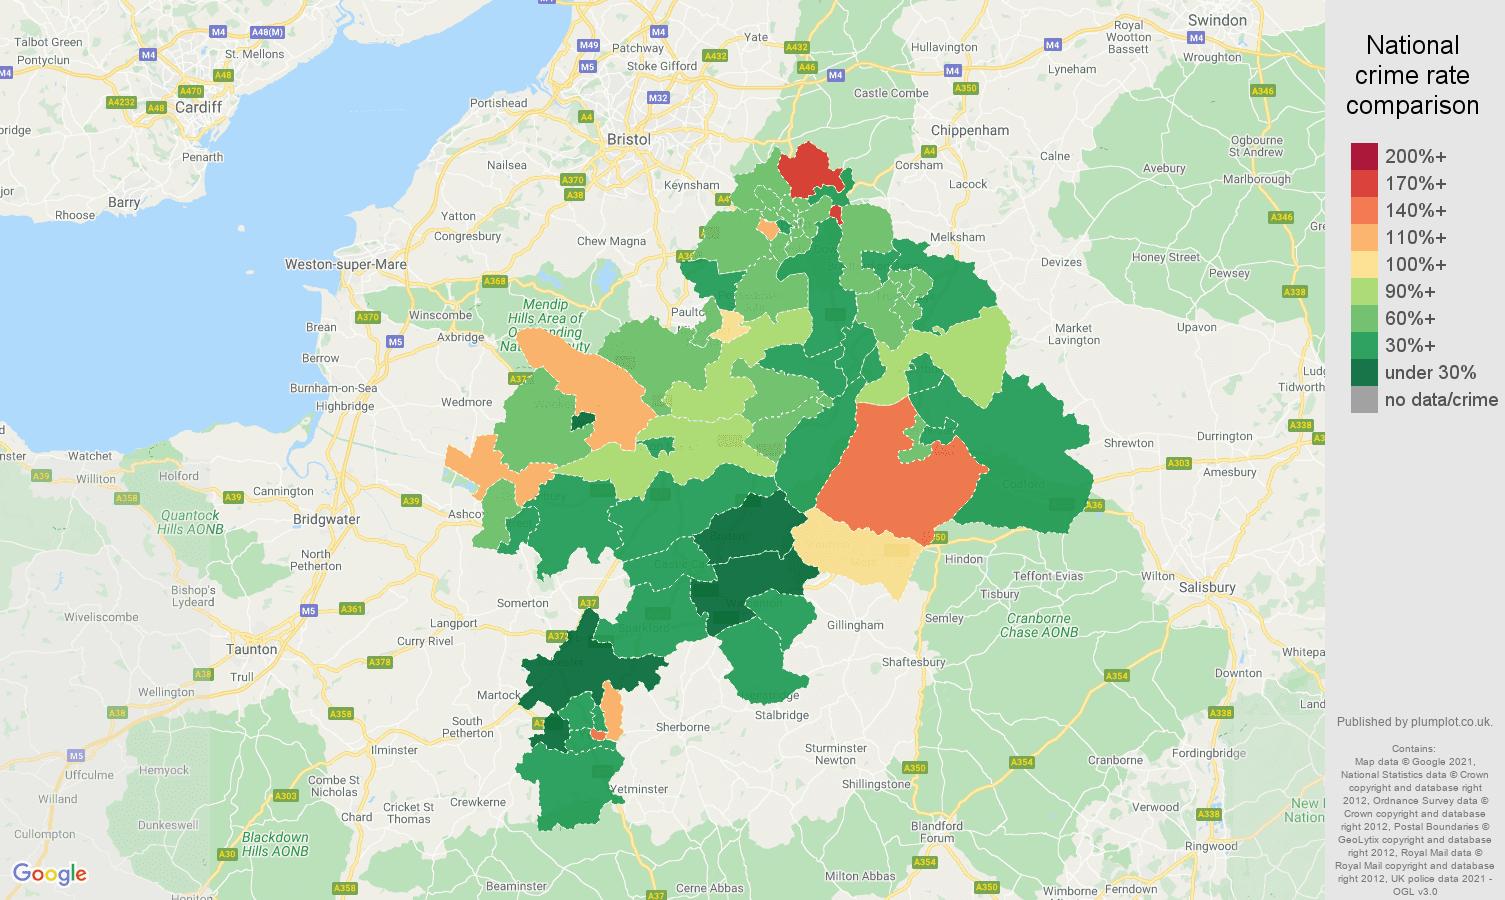 Bath burglary crime rate comparison map